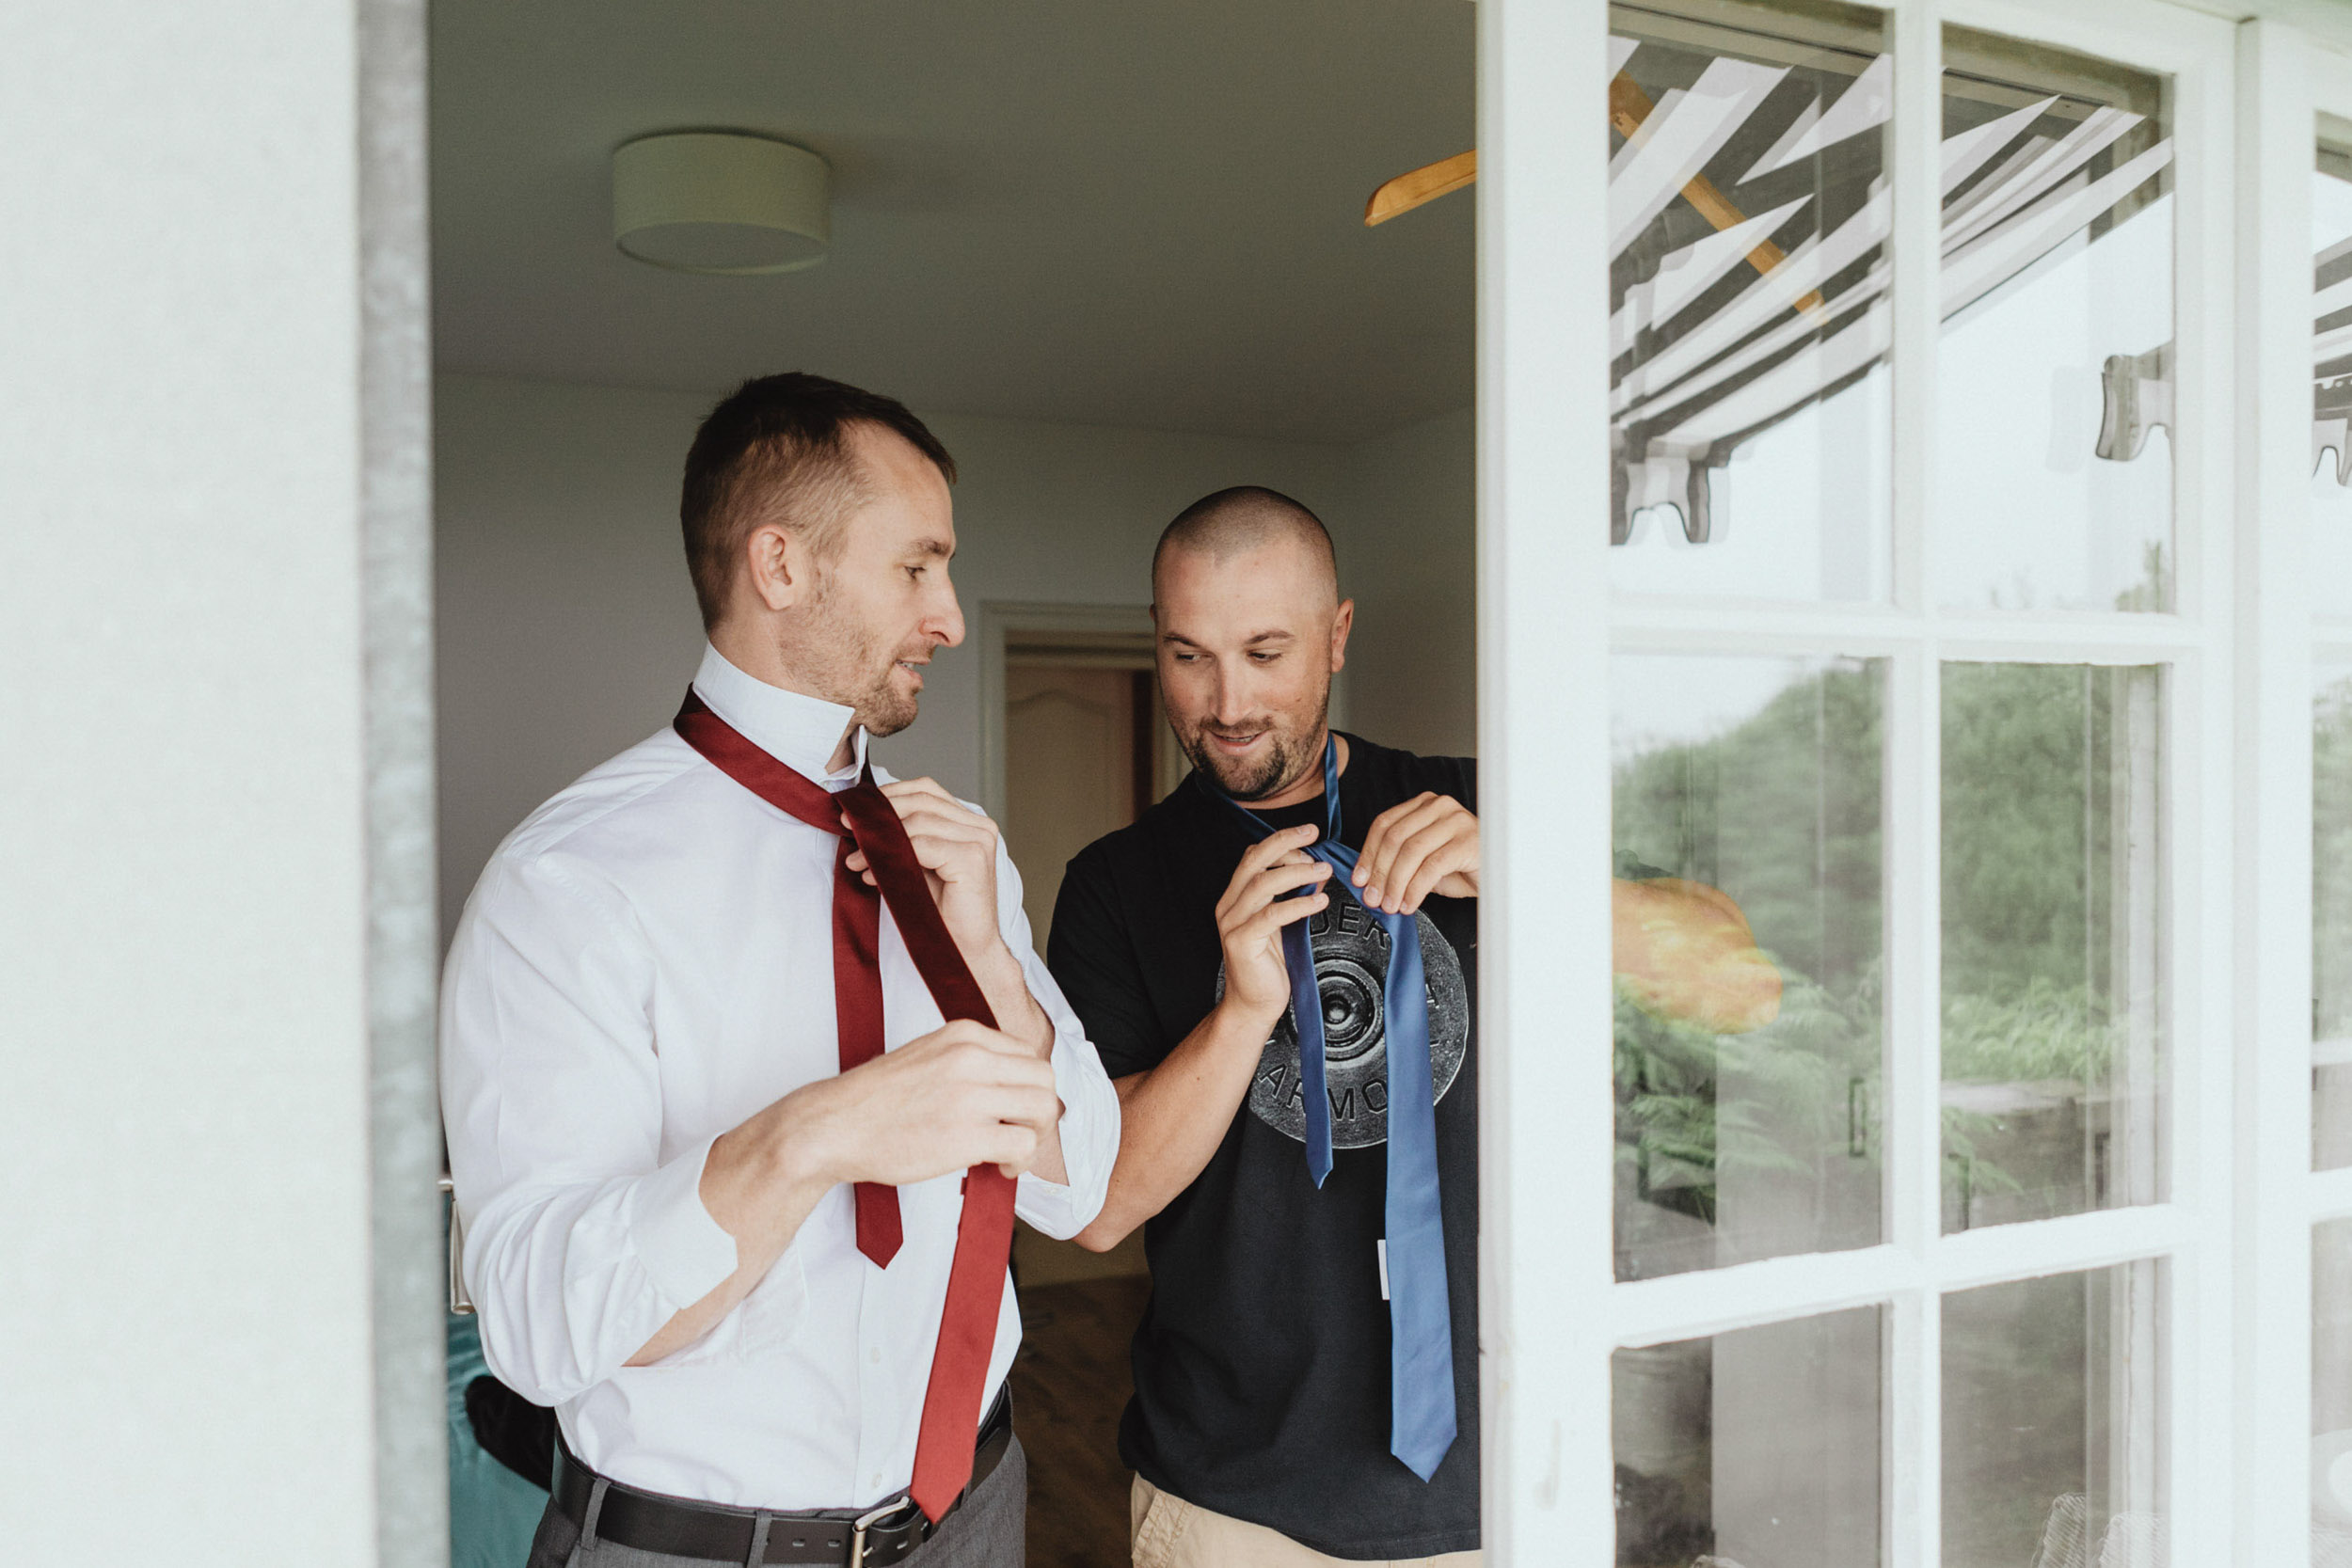 hochzeitsfotografie-schweiz_wedding-photographer-switzerland-europe_Bendik-Photography-018